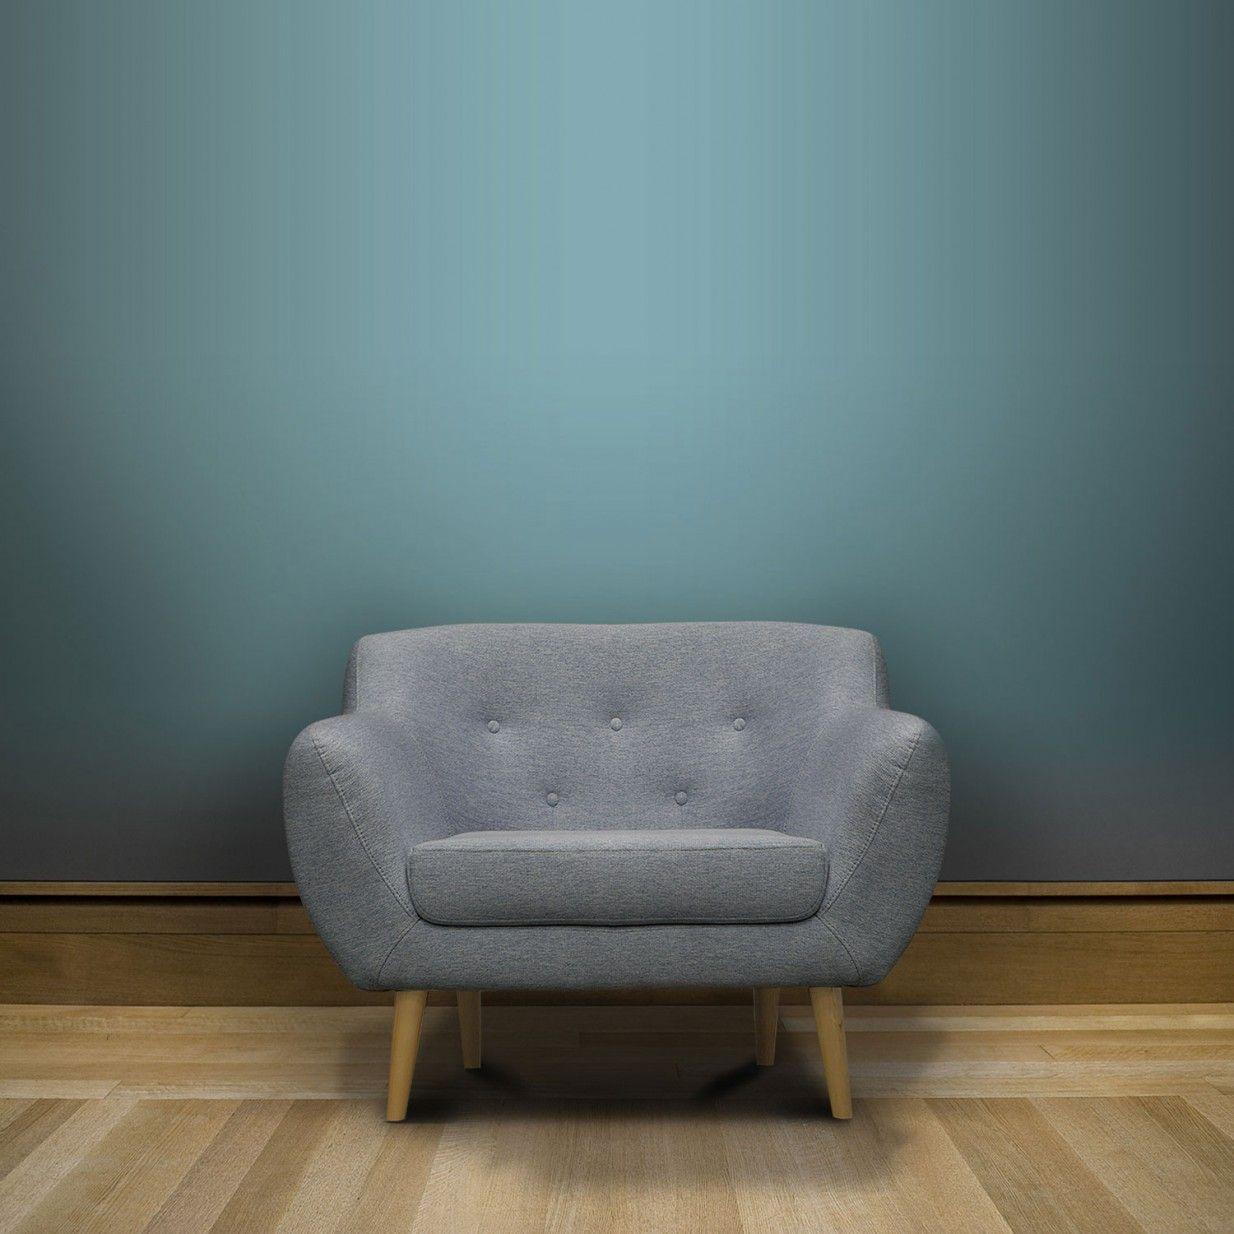 Sicile Sessel Grau Blau Mazzini Sofas Sessel Grau Couch Mobel Sessel